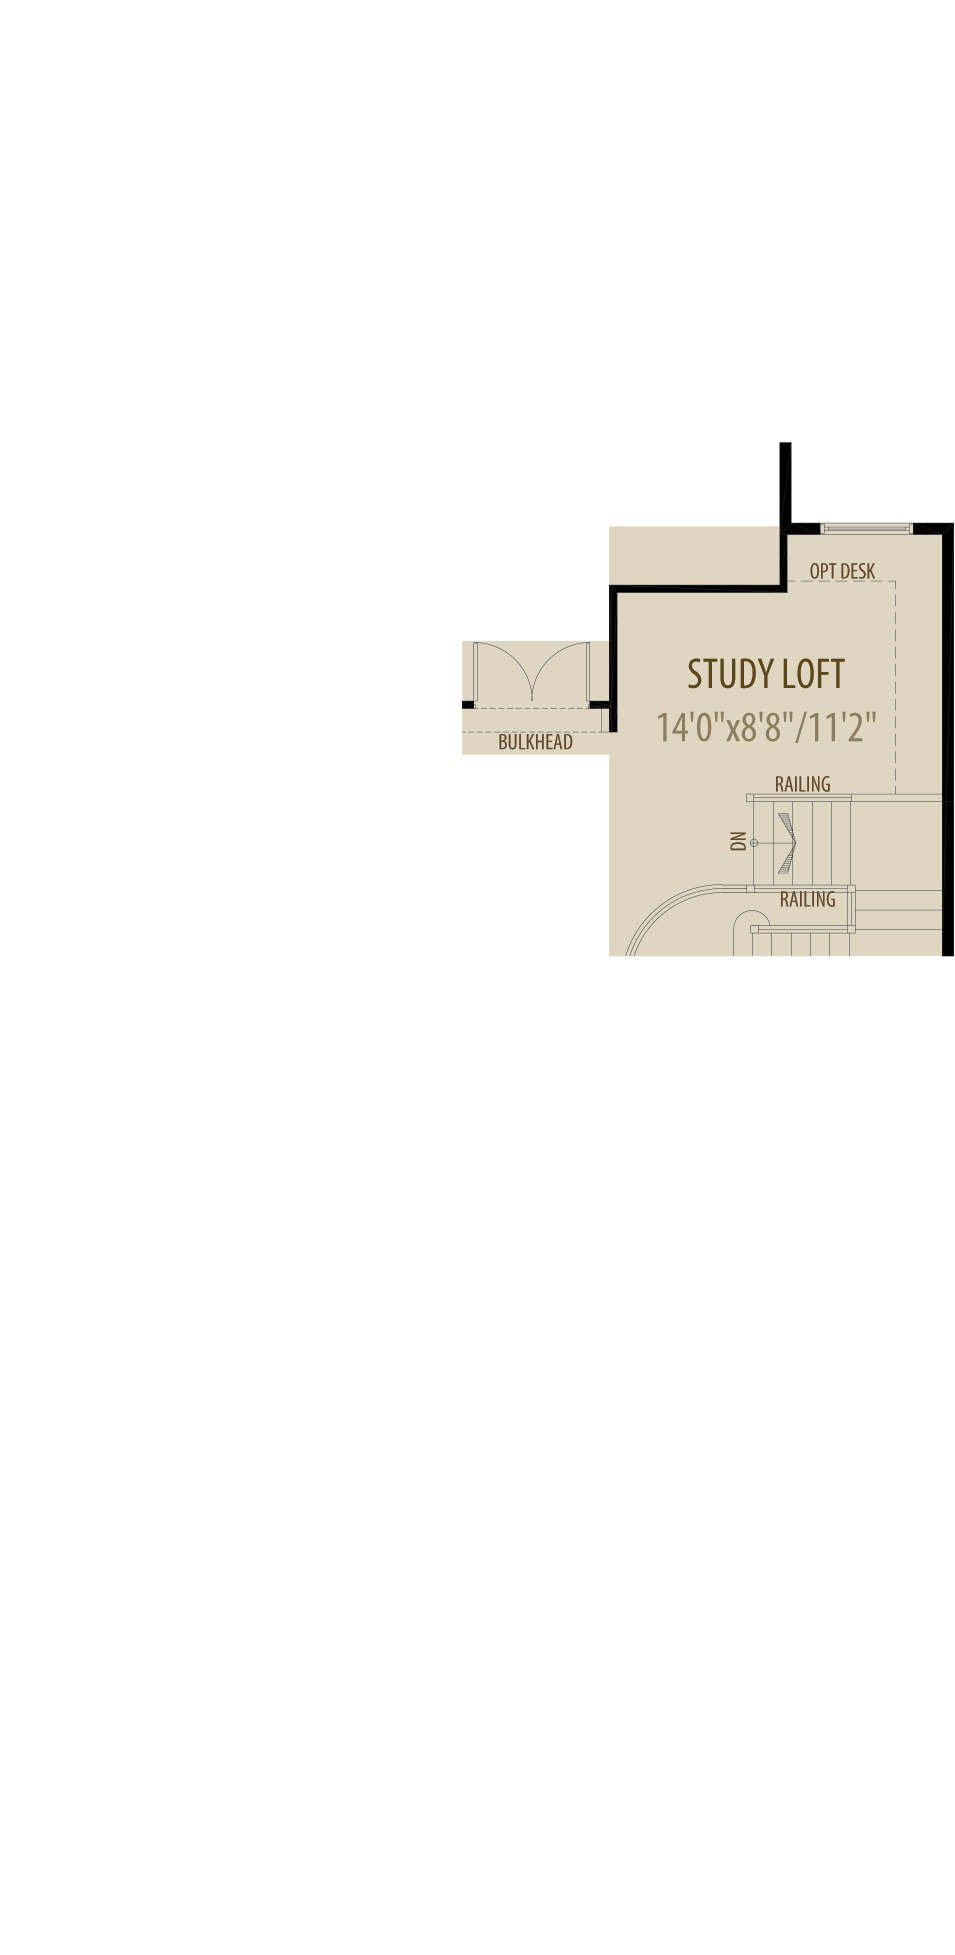 Study Loft